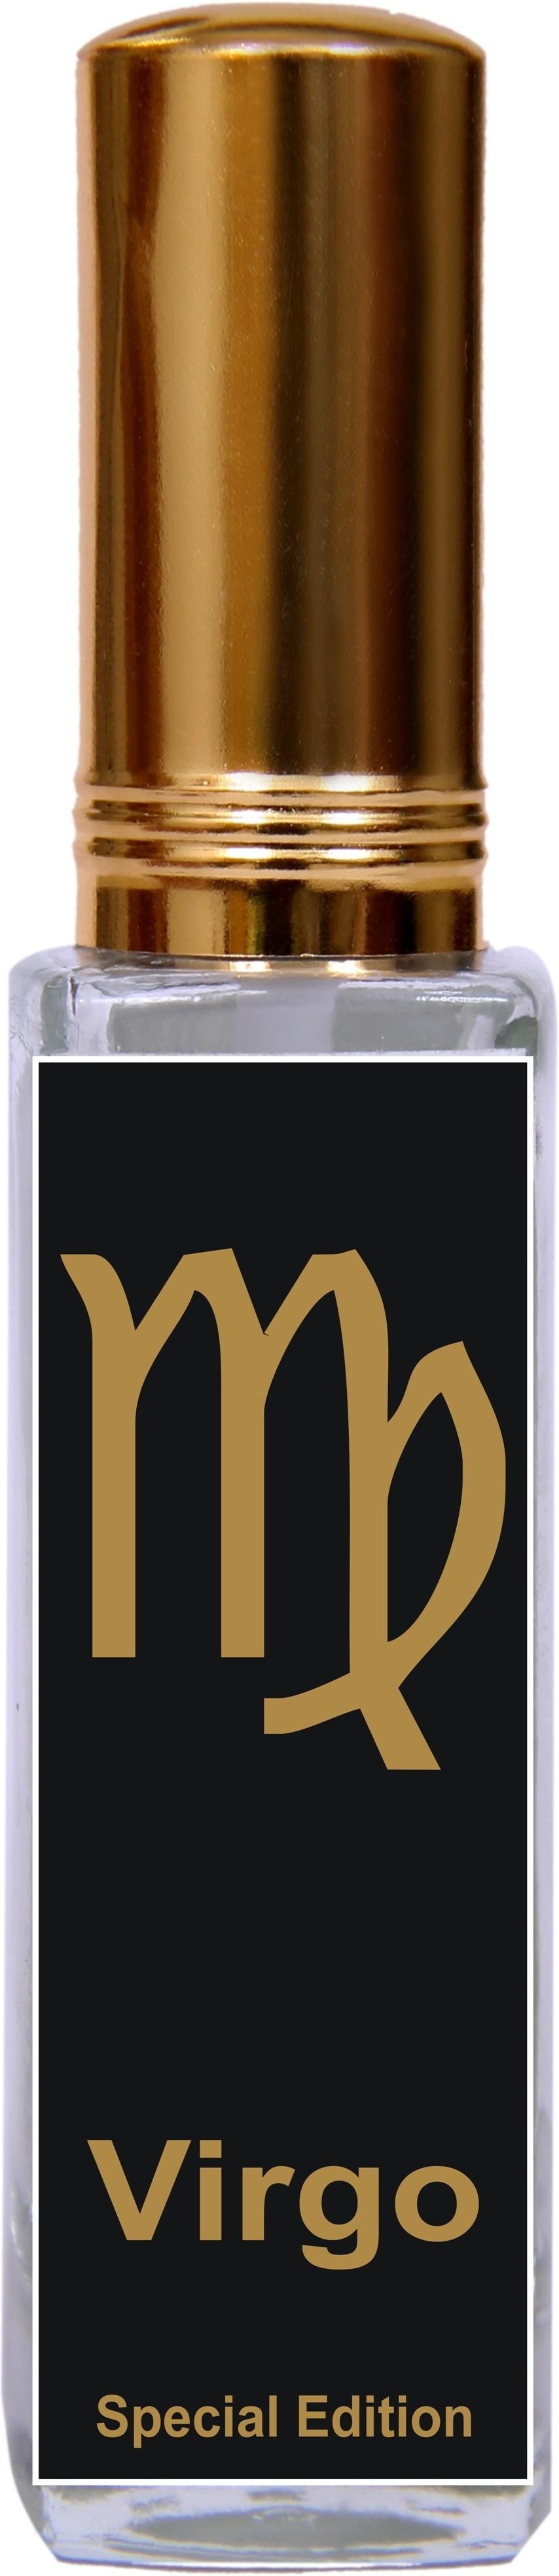 Raviour Lifestyle Virgo Zodiac Blend Perfume Eau de Parfum  -  25 ml(For Men & Women, Boys & Girls)